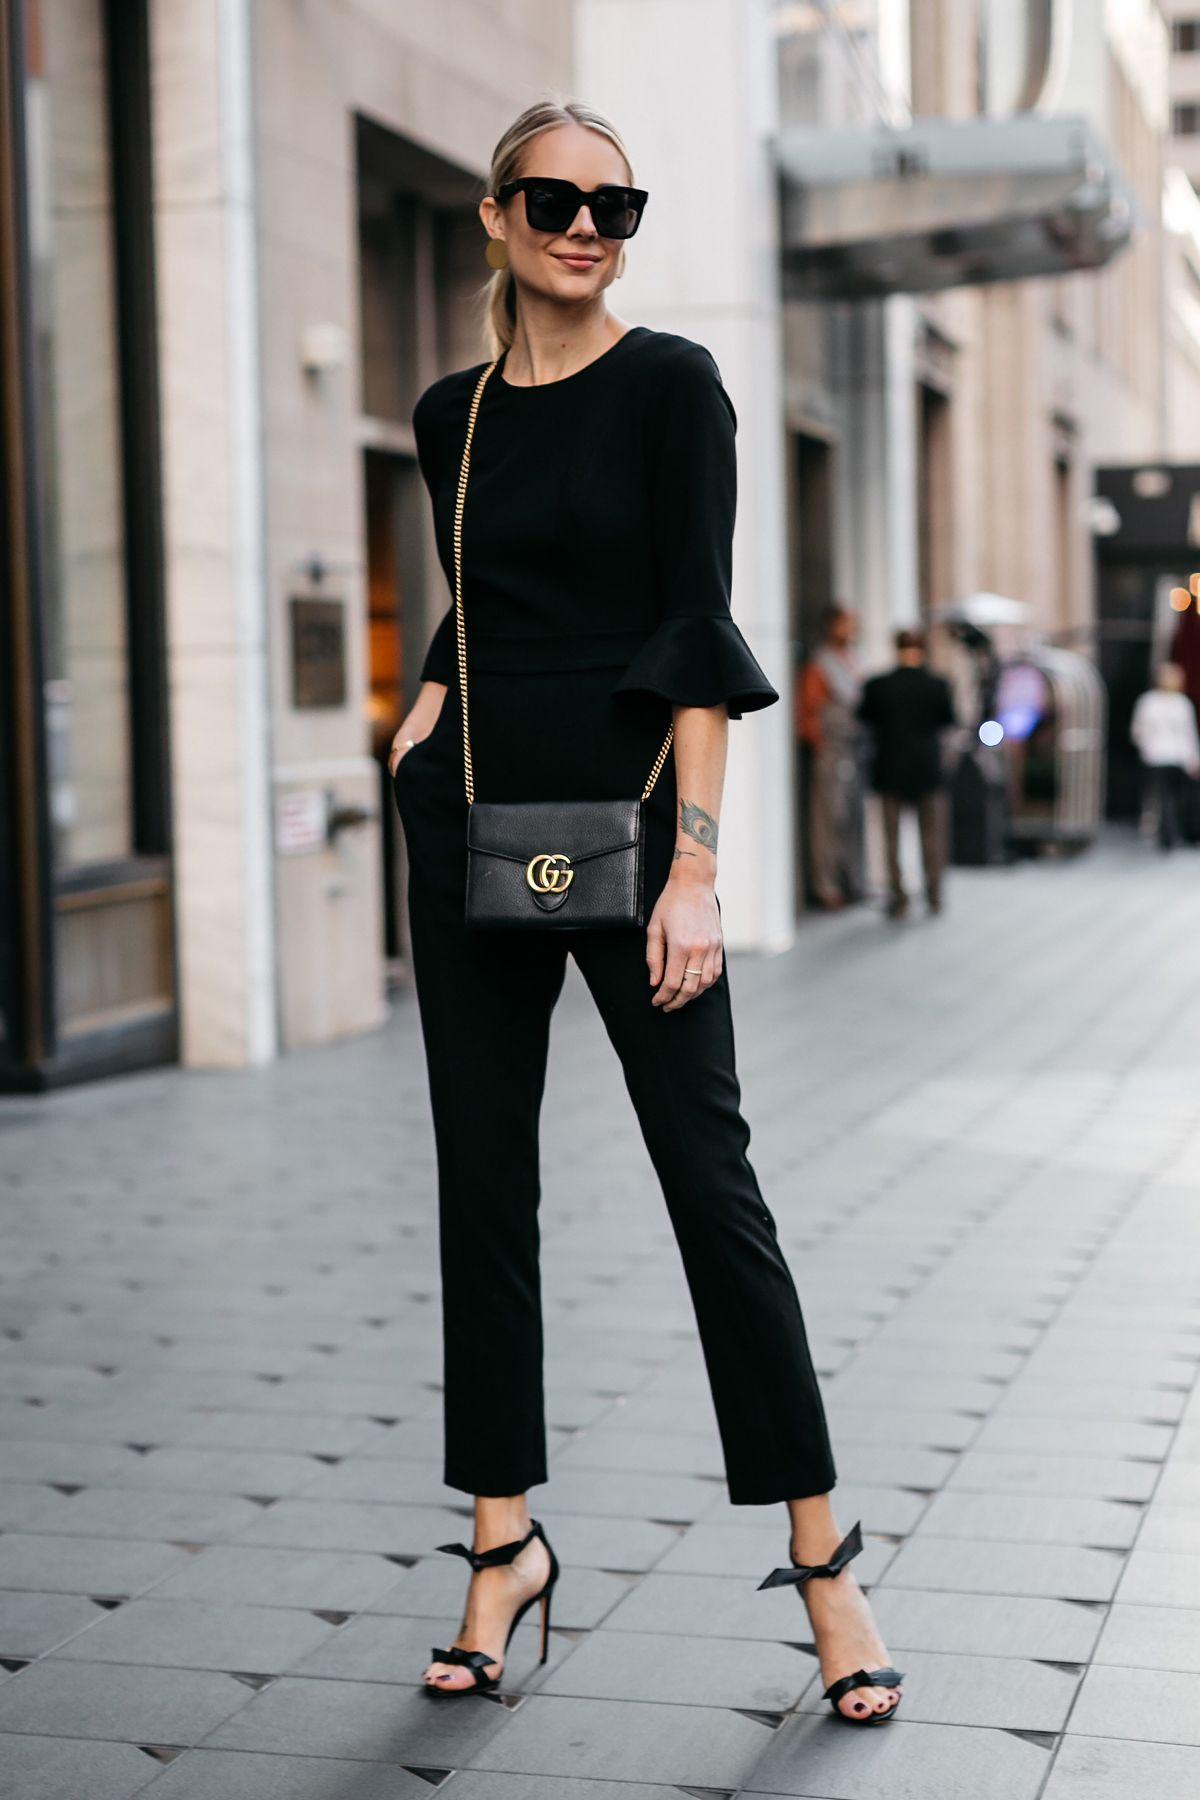 33ebcdf1d51d8 Blonde Woman Wearing Black Ruffle Sleeve Jumpsuit Gucci Marmont Black  Handbag Black Bow Tie Heels Gold Disc Earrings Black Celine Sunglasses  Fashion Jackson ...